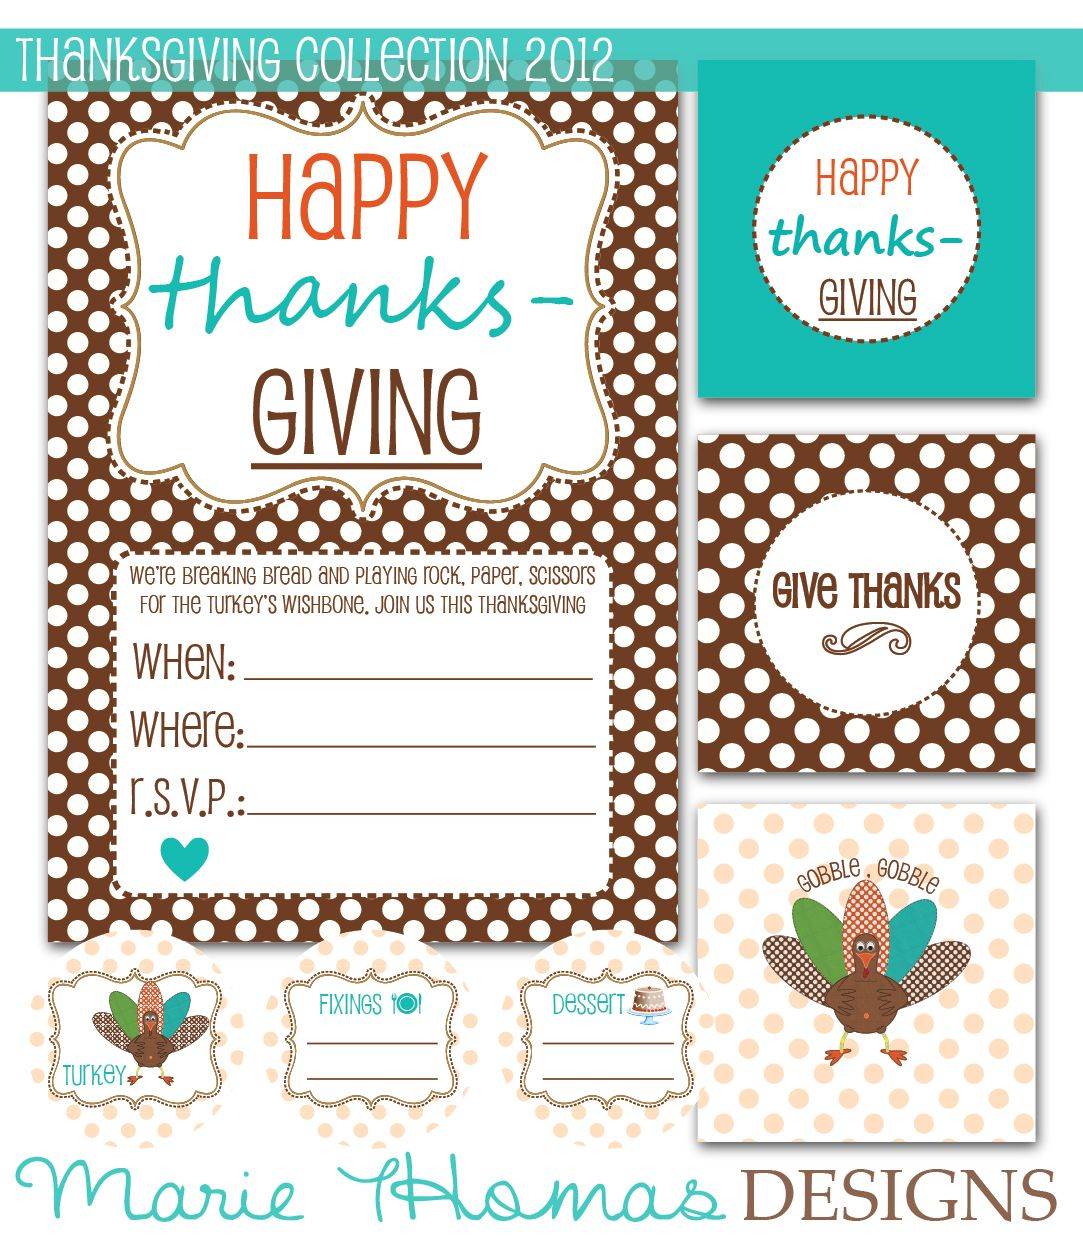 Thanksgiving Printable Collection